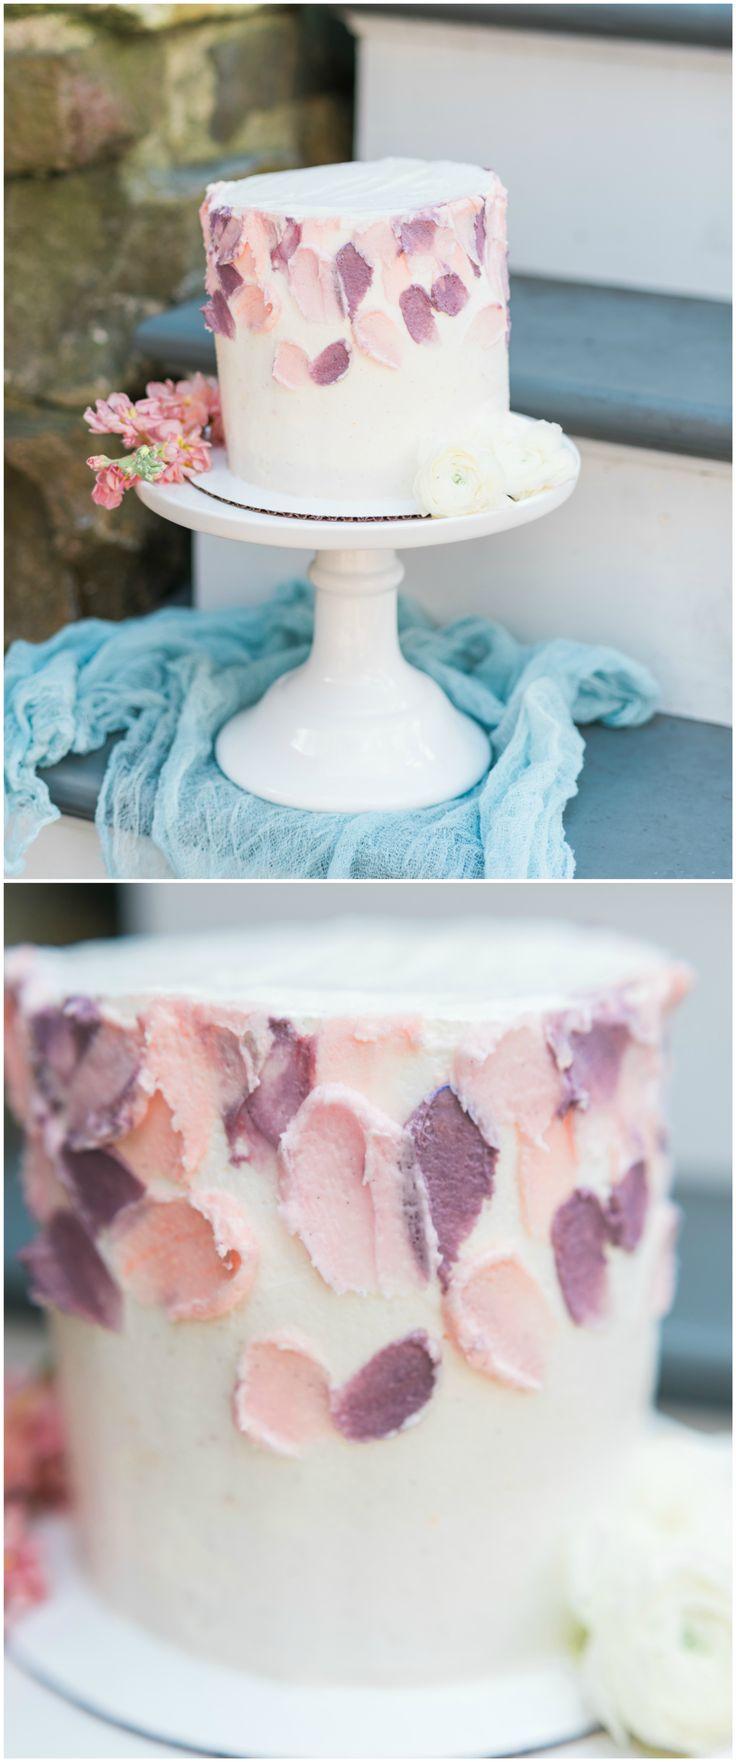 Petite wedding cake, white buttercream, pastel pink and purple // Rae Marshall Photography